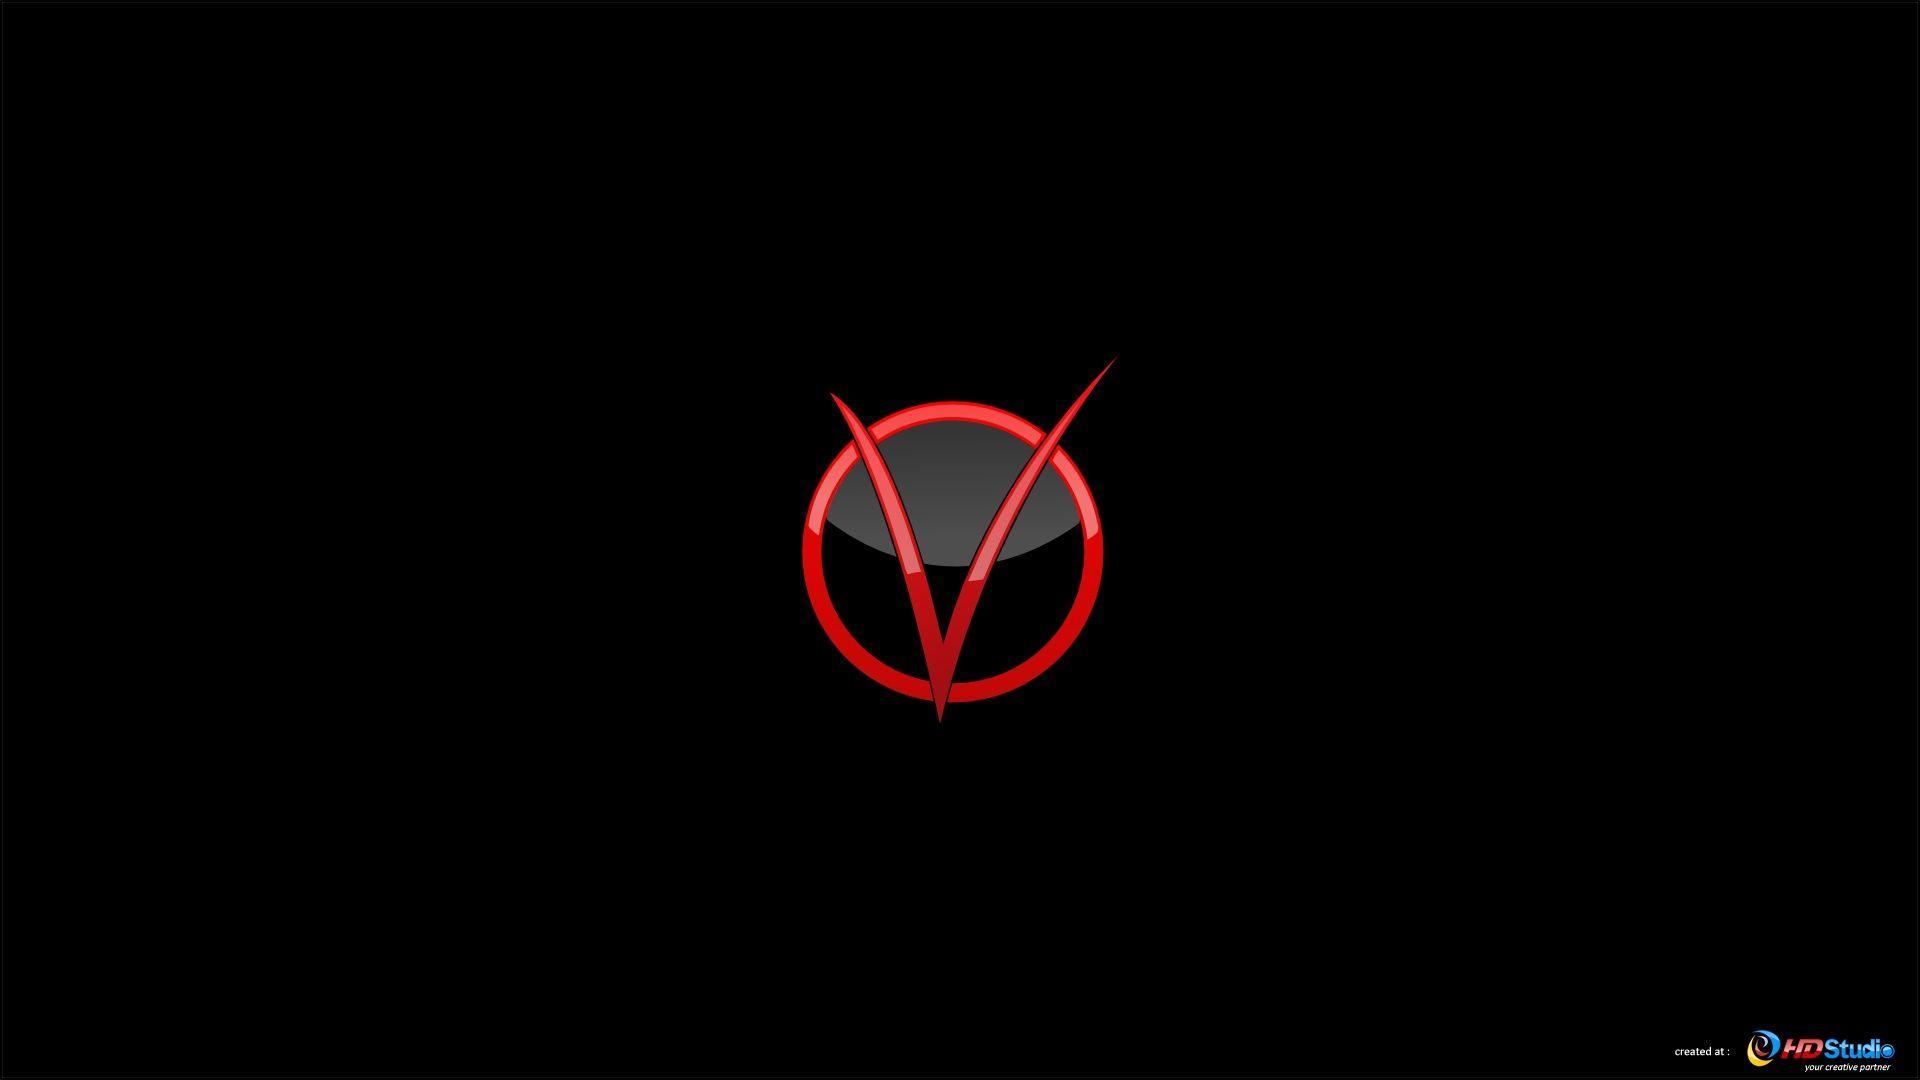 V For Vendetta Wallpapers Hd Wallpaper Cave